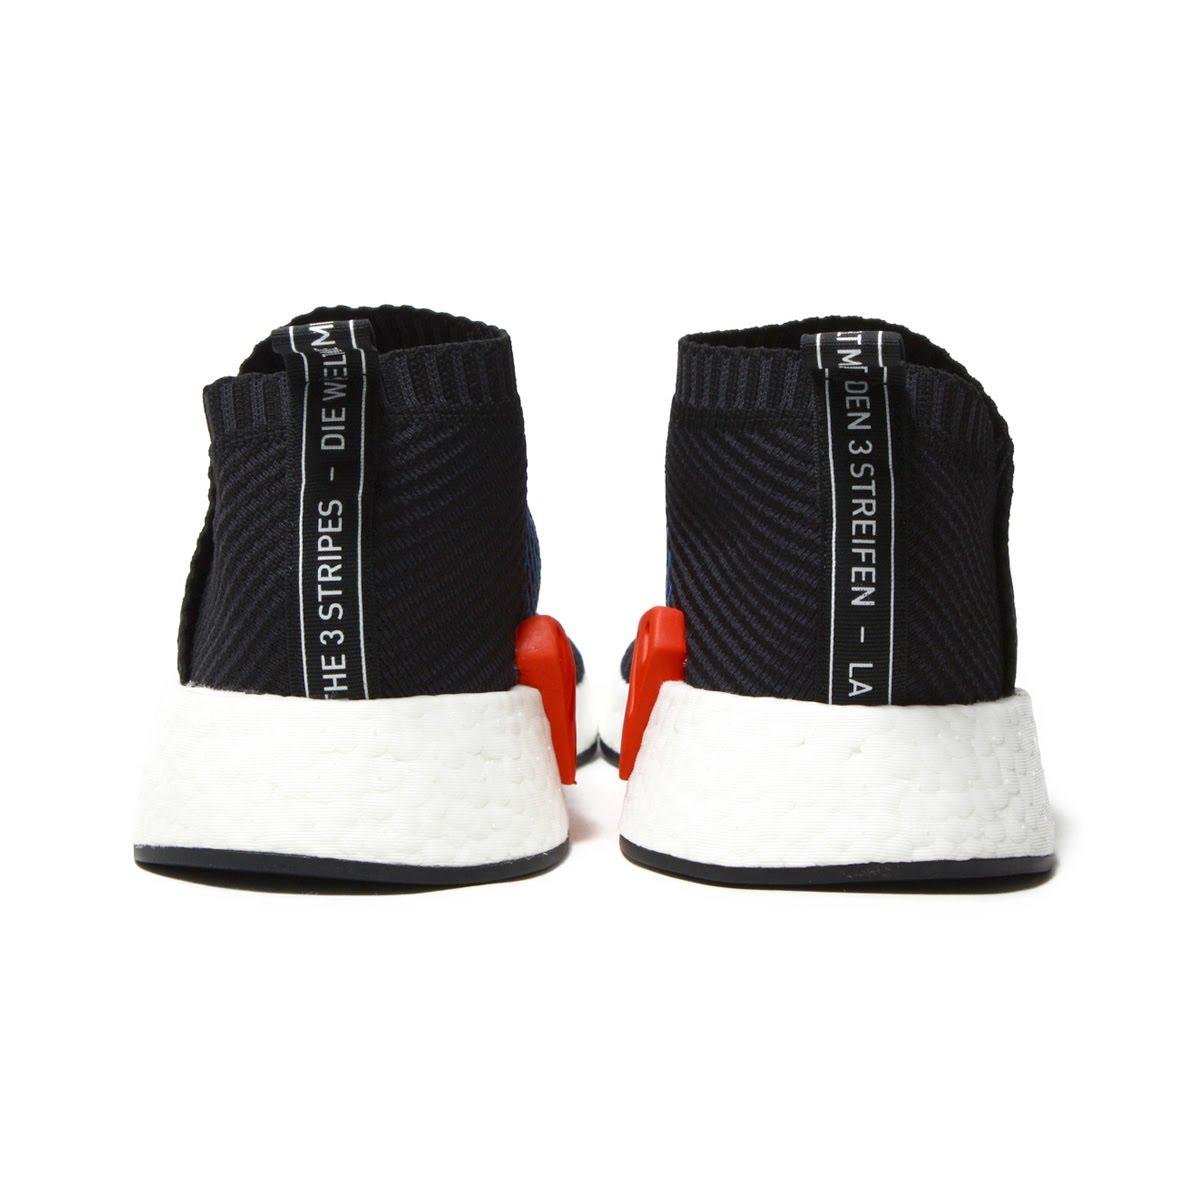 adidas Originals NMD CS2 PK in schwarz CQ2372 | everysize